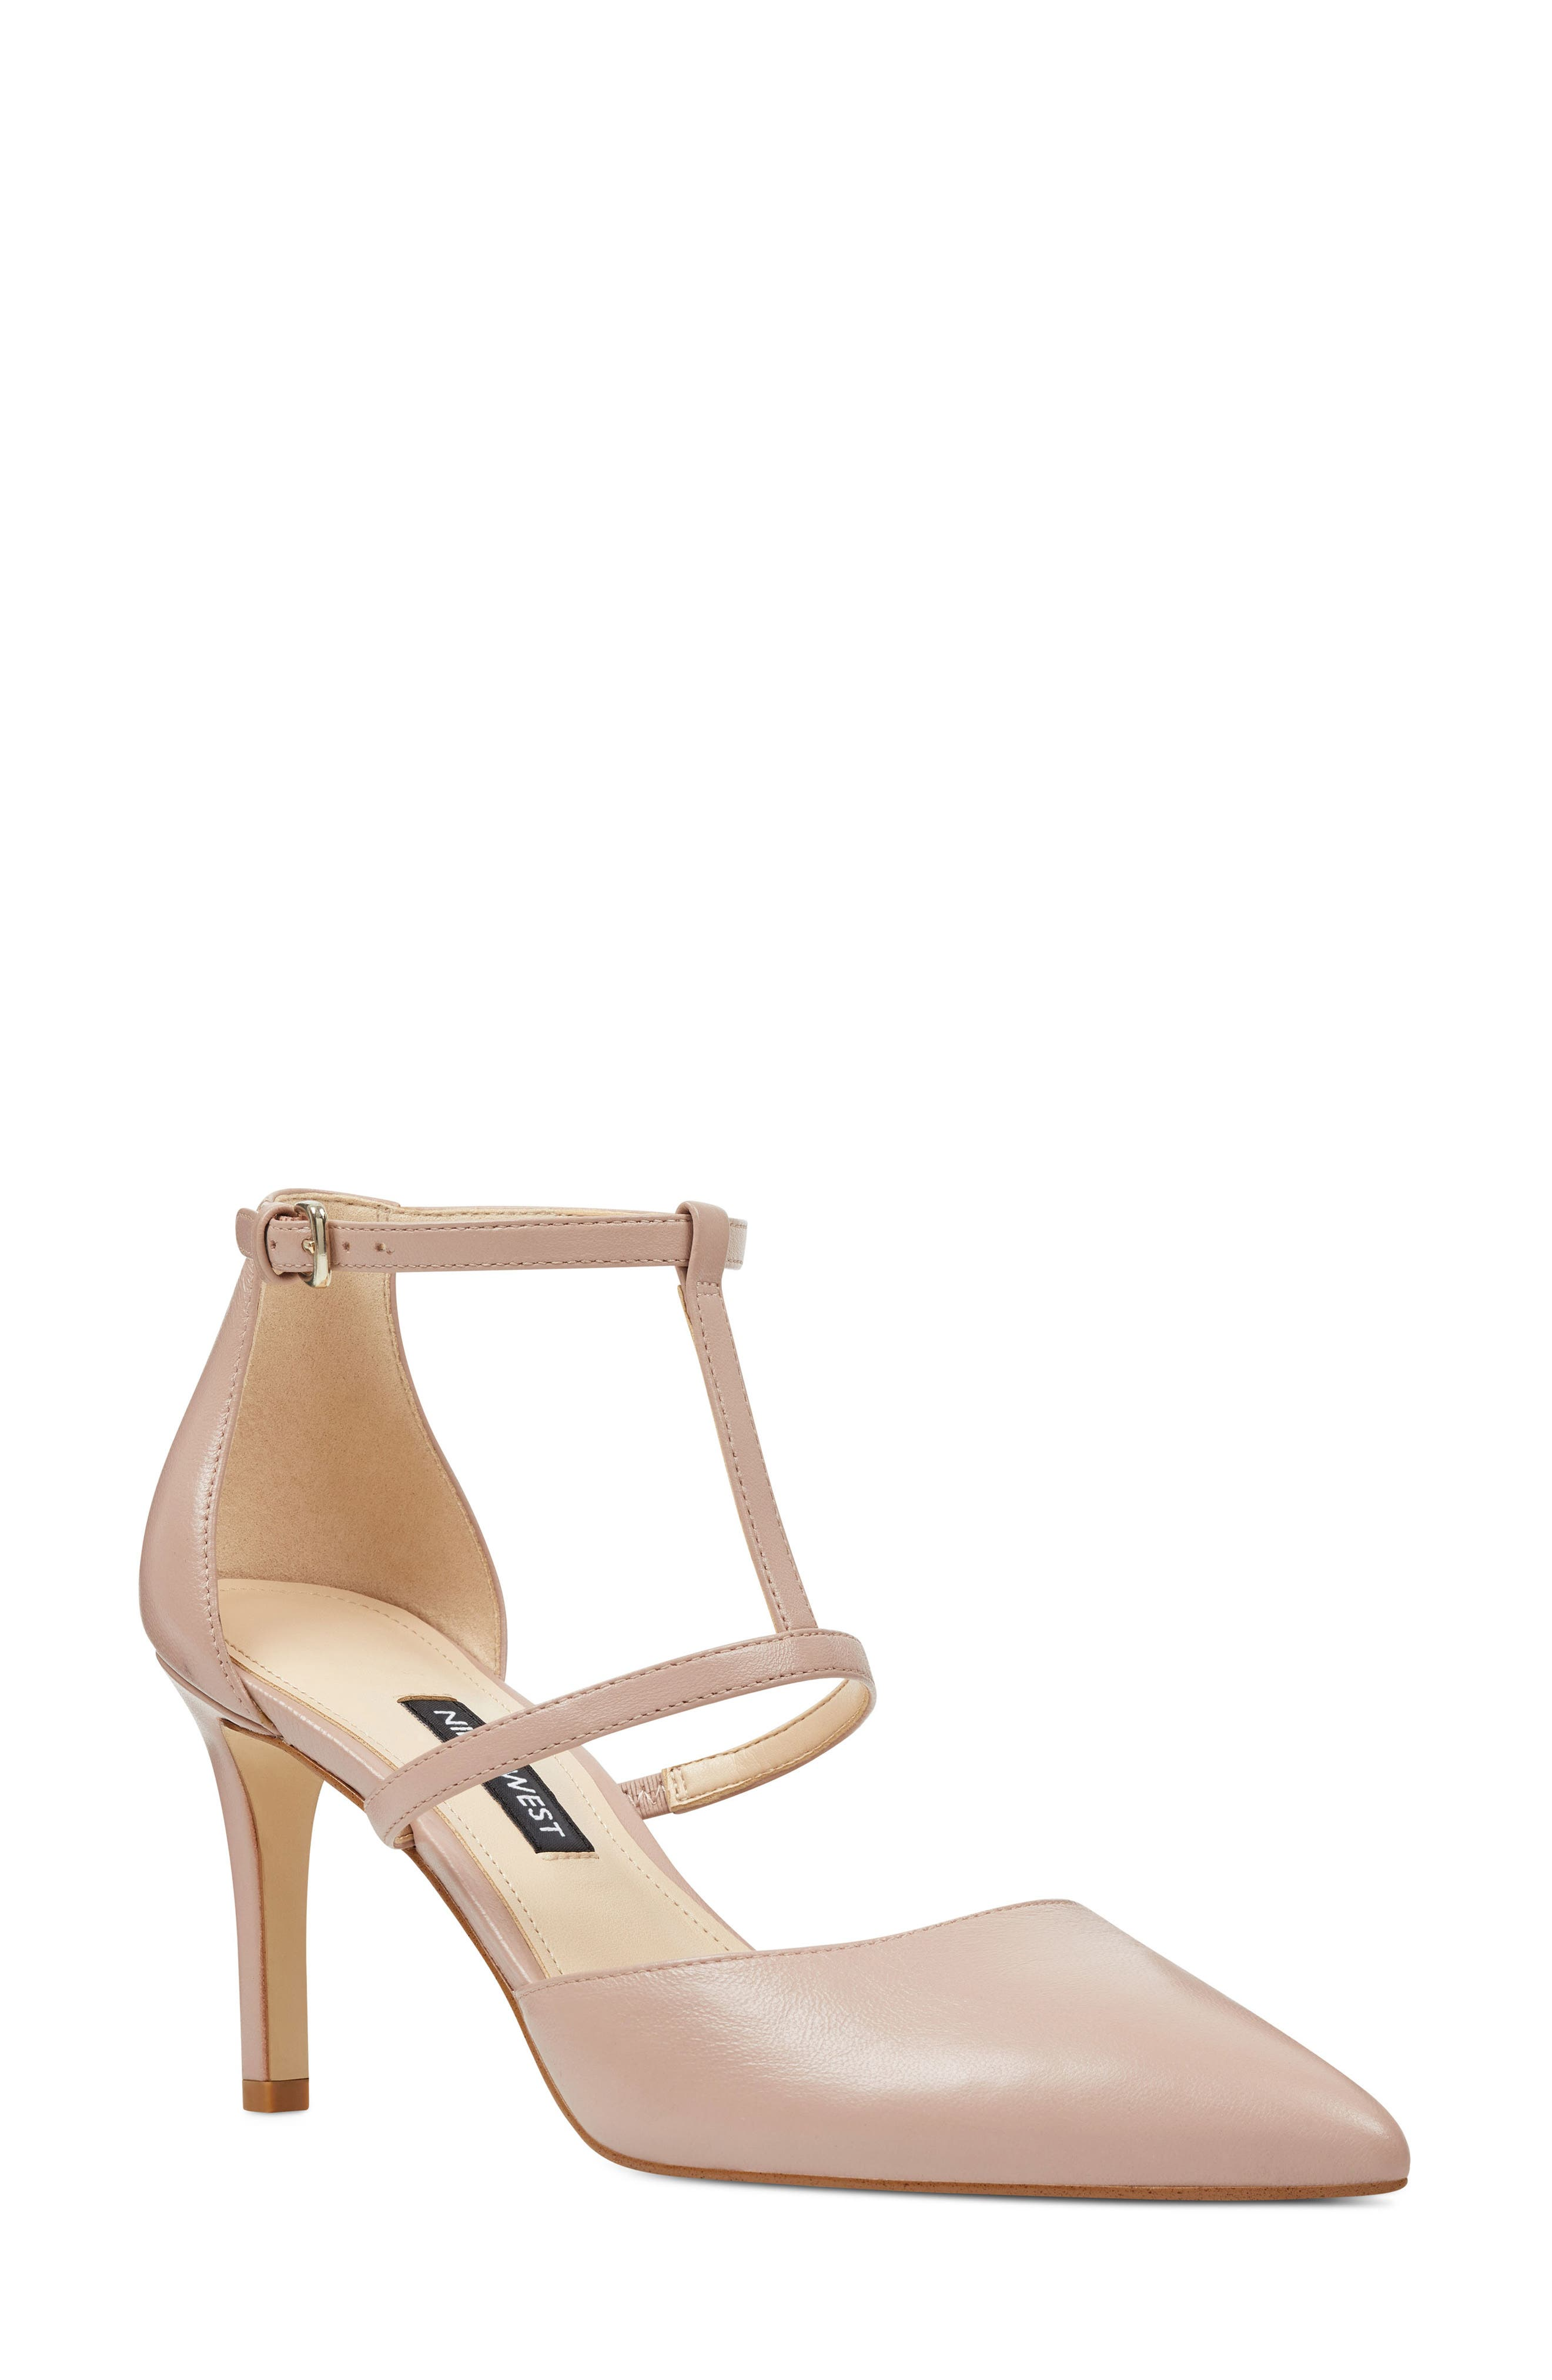 Nine West Cintia Ankle Strap Pump- Pink